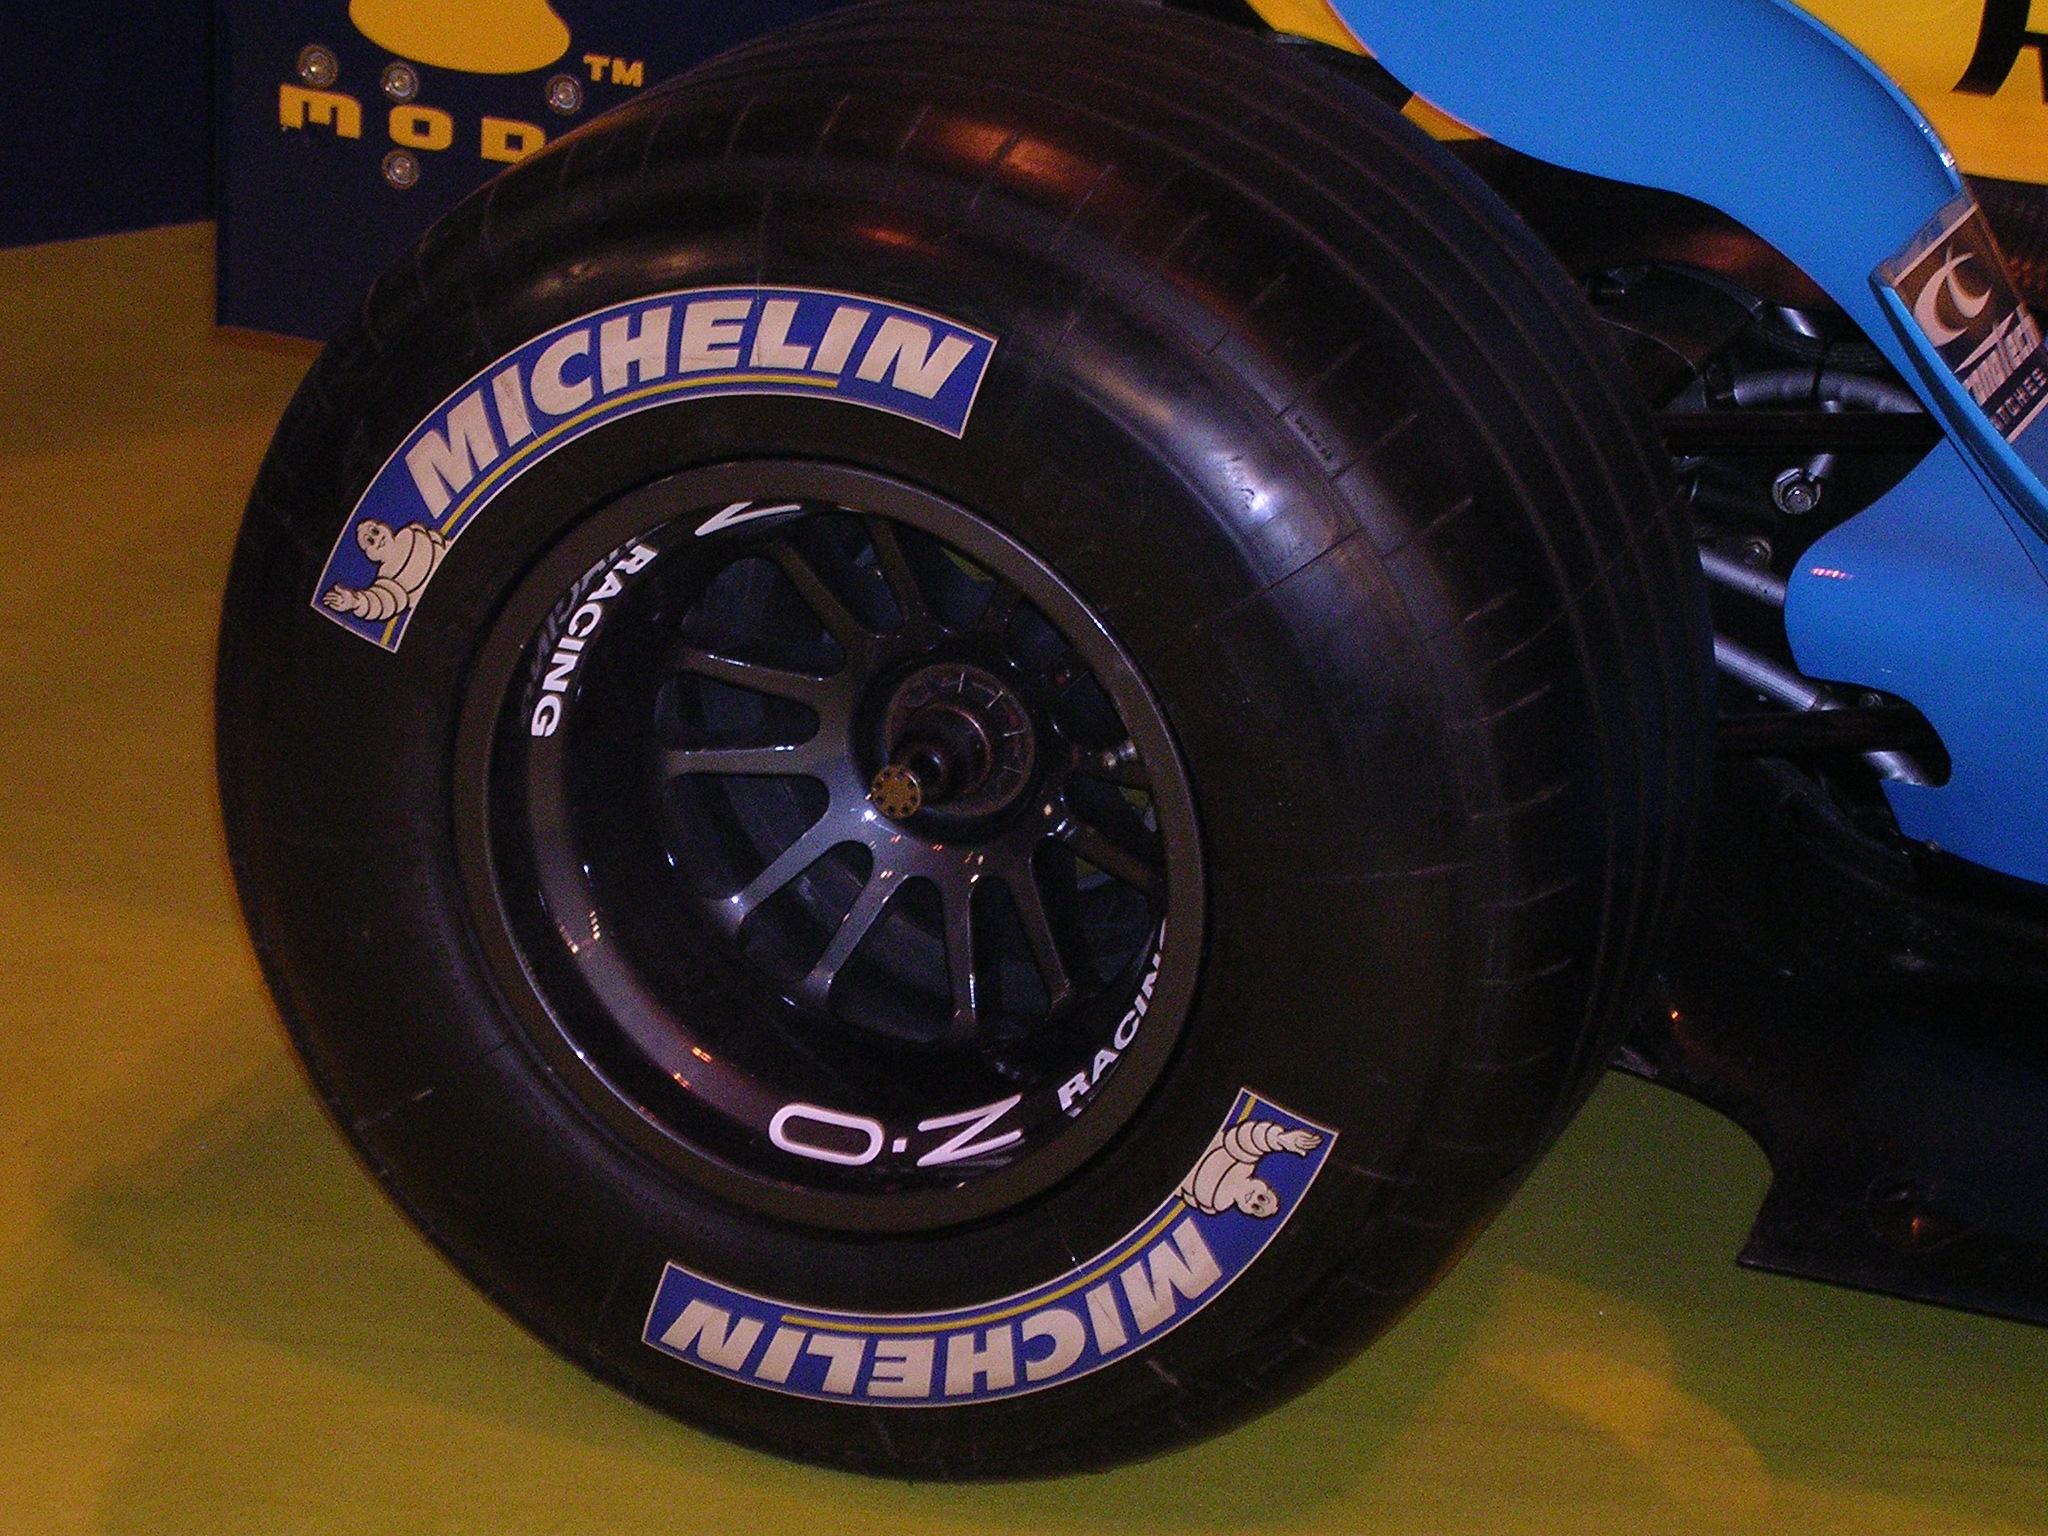 Pneu Michelin Moto Harley Davidson